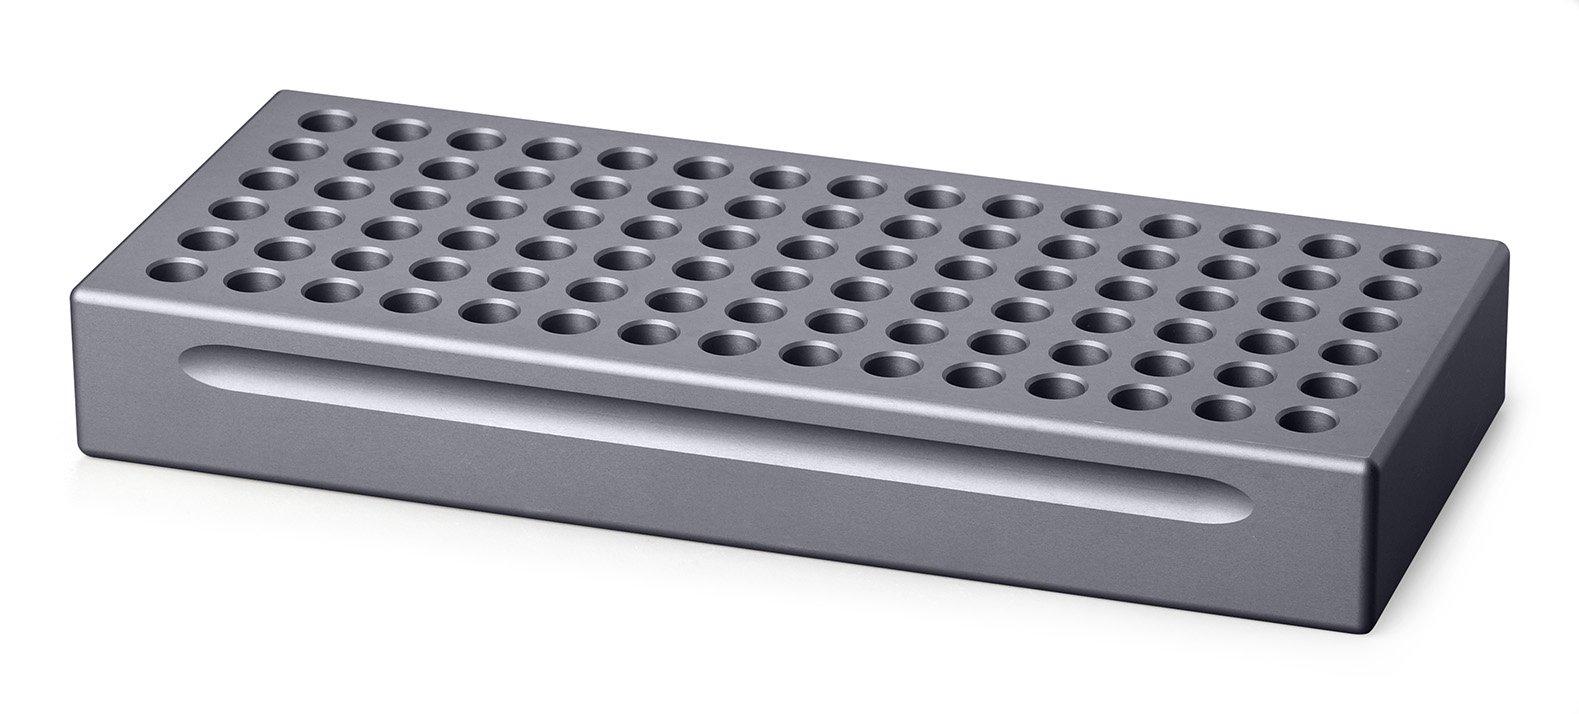 Biocision BCS-102 Grey CoolRack M90 Tube Holder for 90 x 1.5 or 2 mL Microfuge Tubes